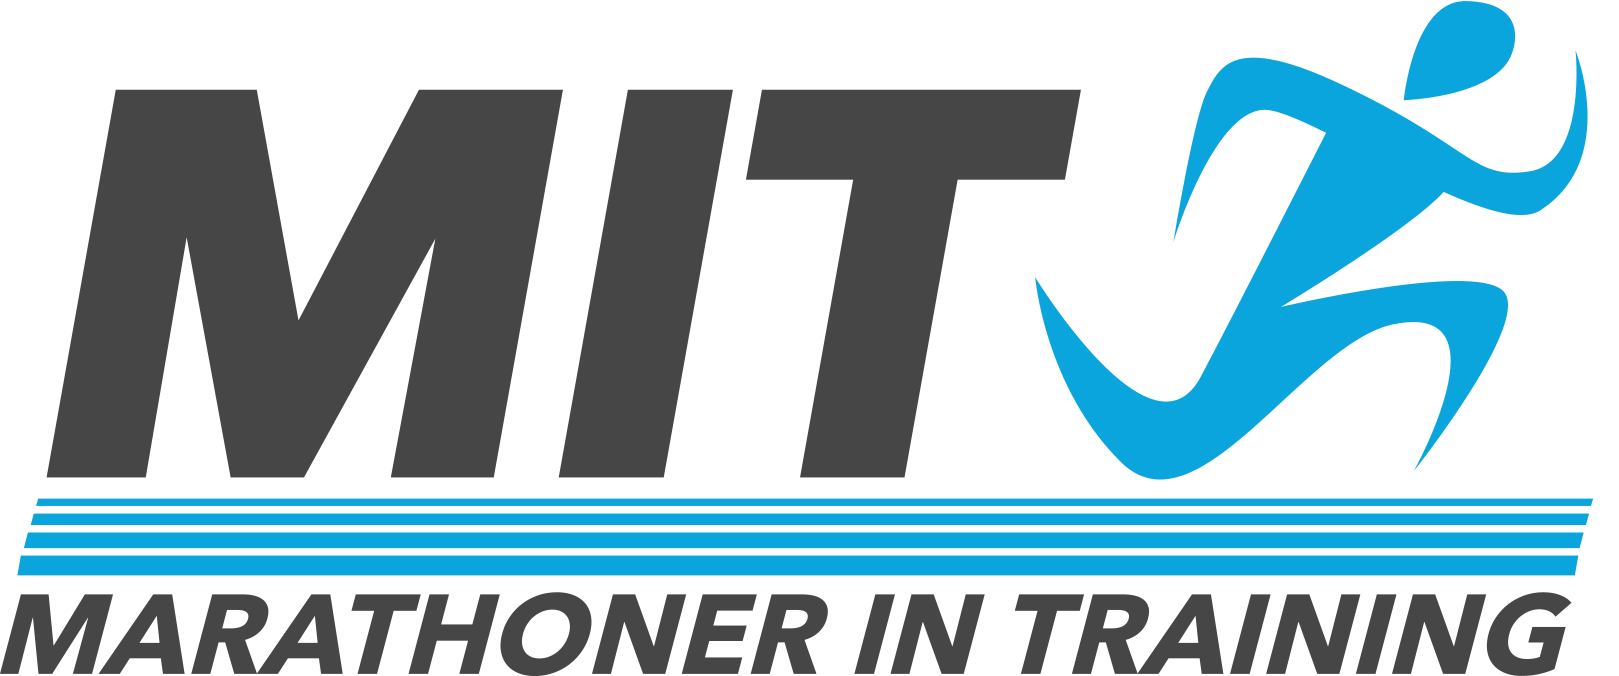 MIT-2019.png